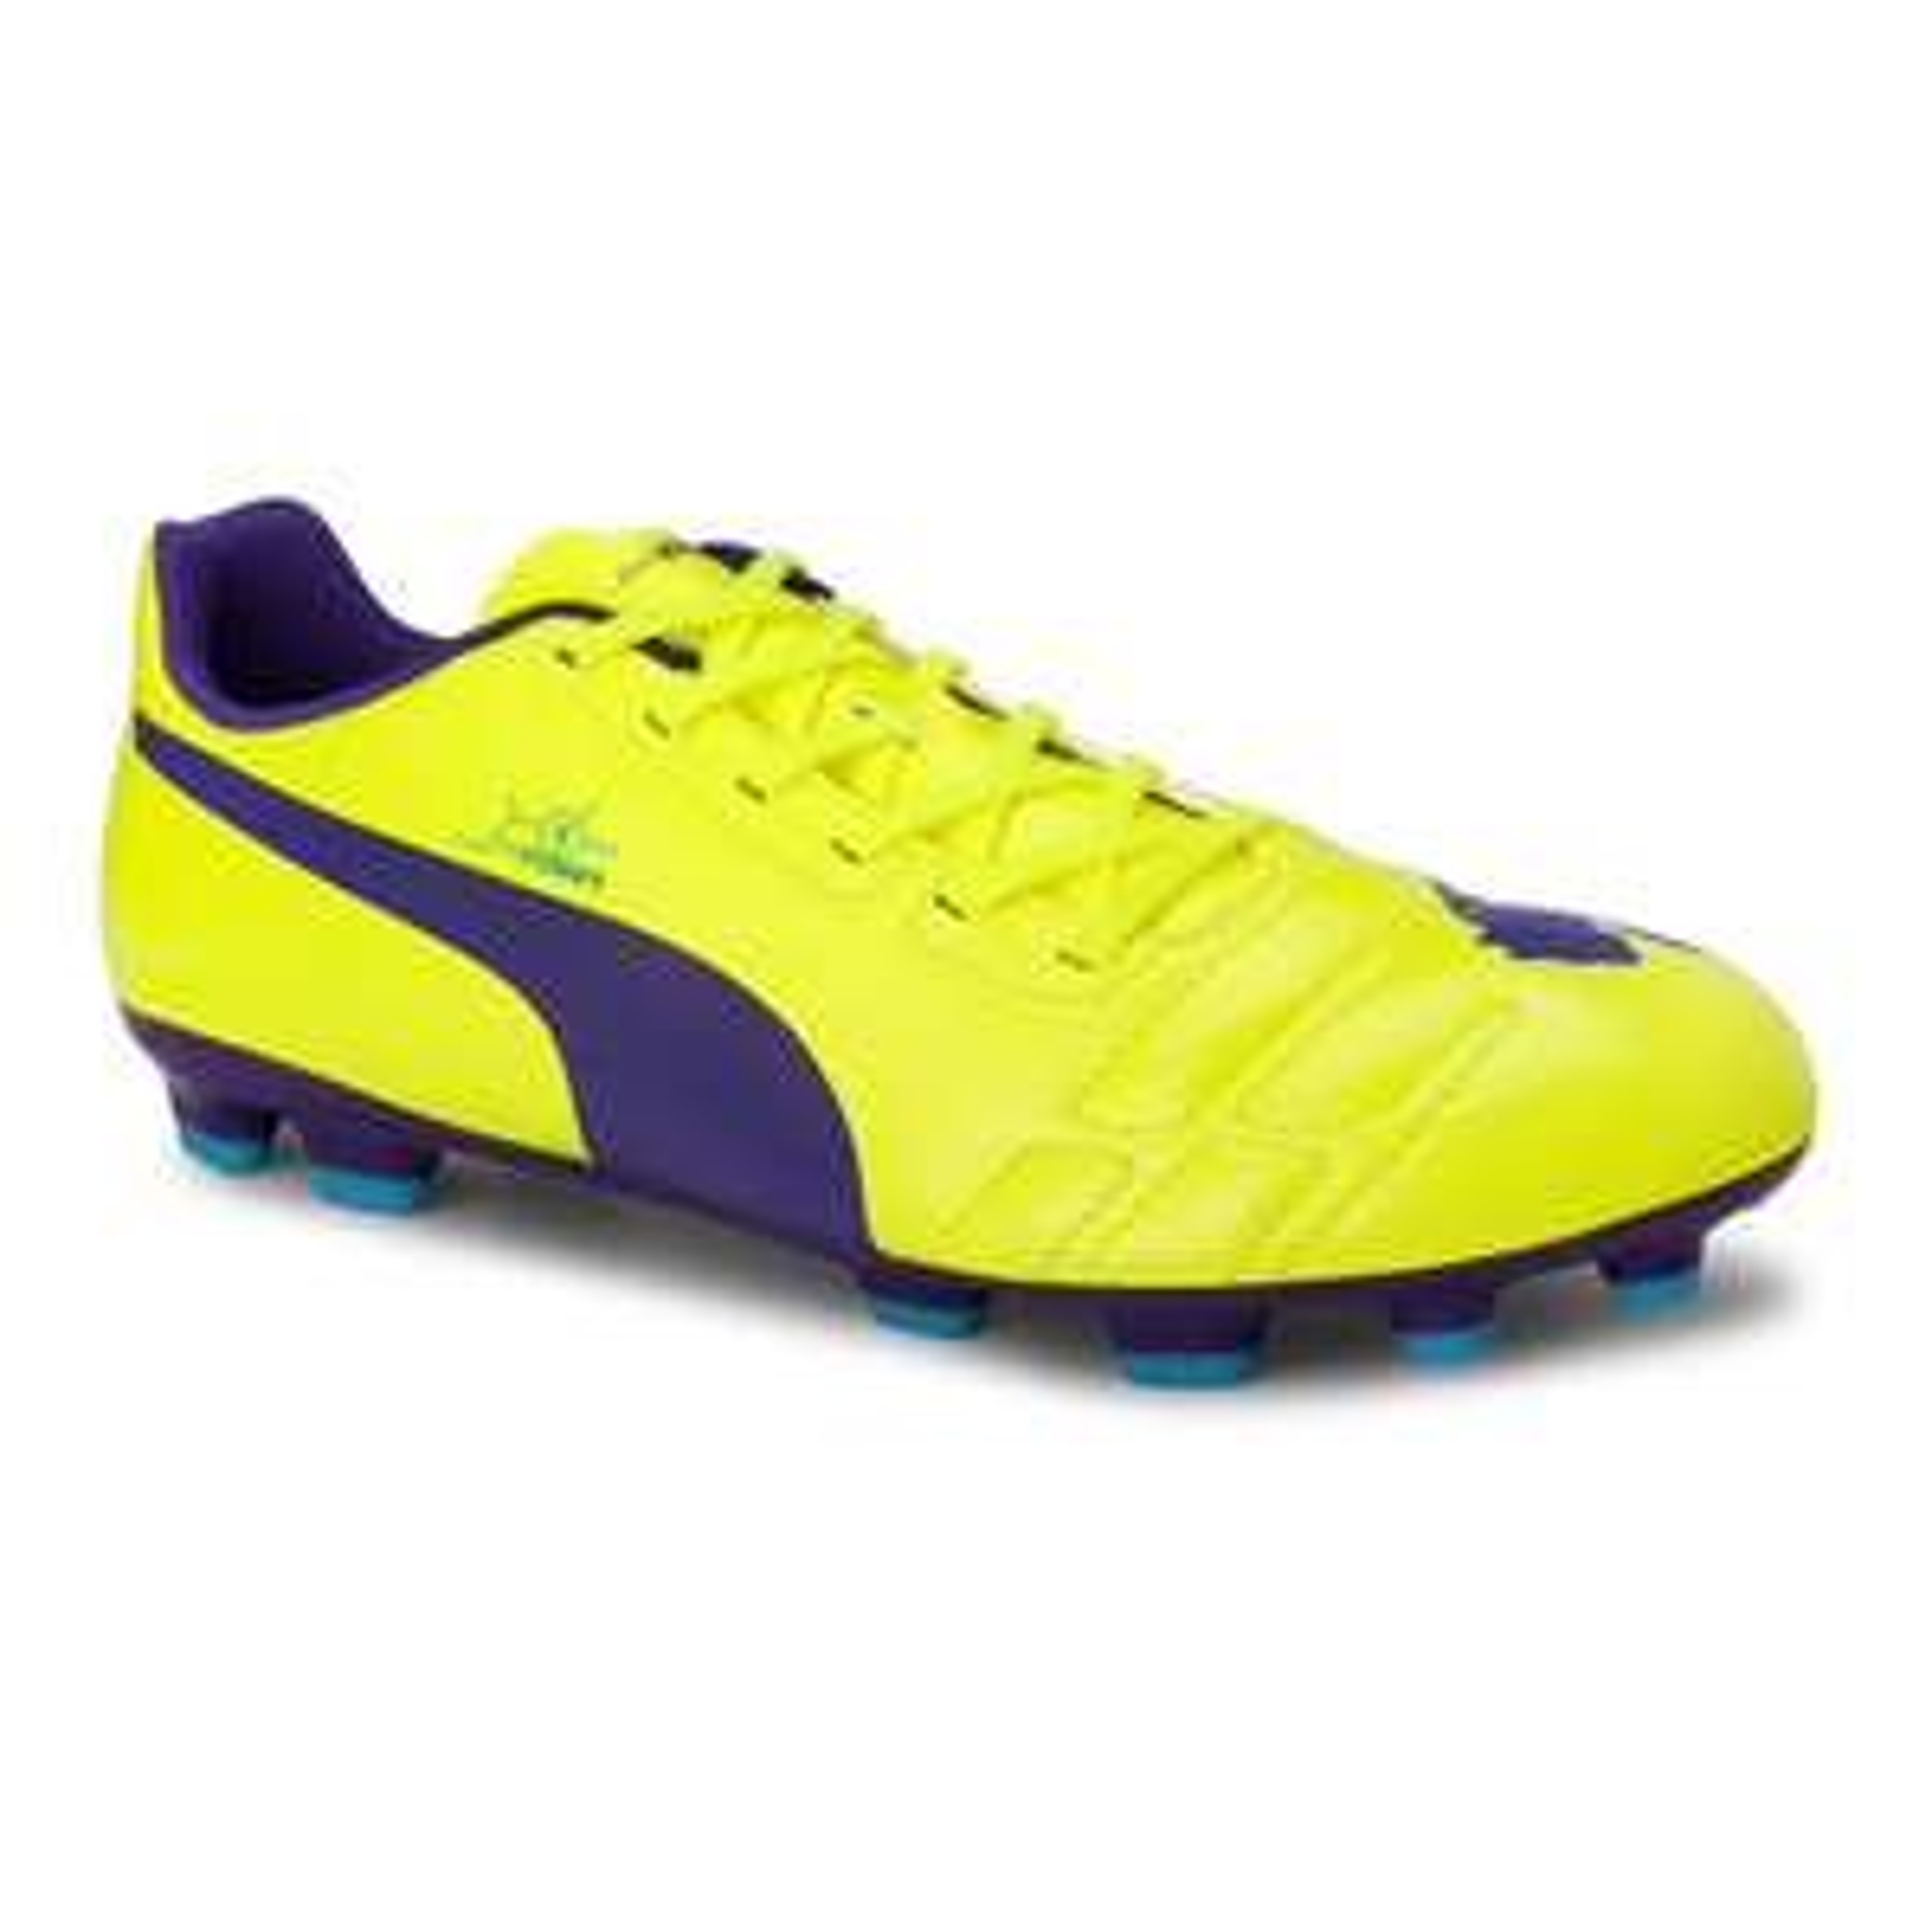 PUMA Evo Power 4 FG voetbalschoenen voor €18 @ PerrySport